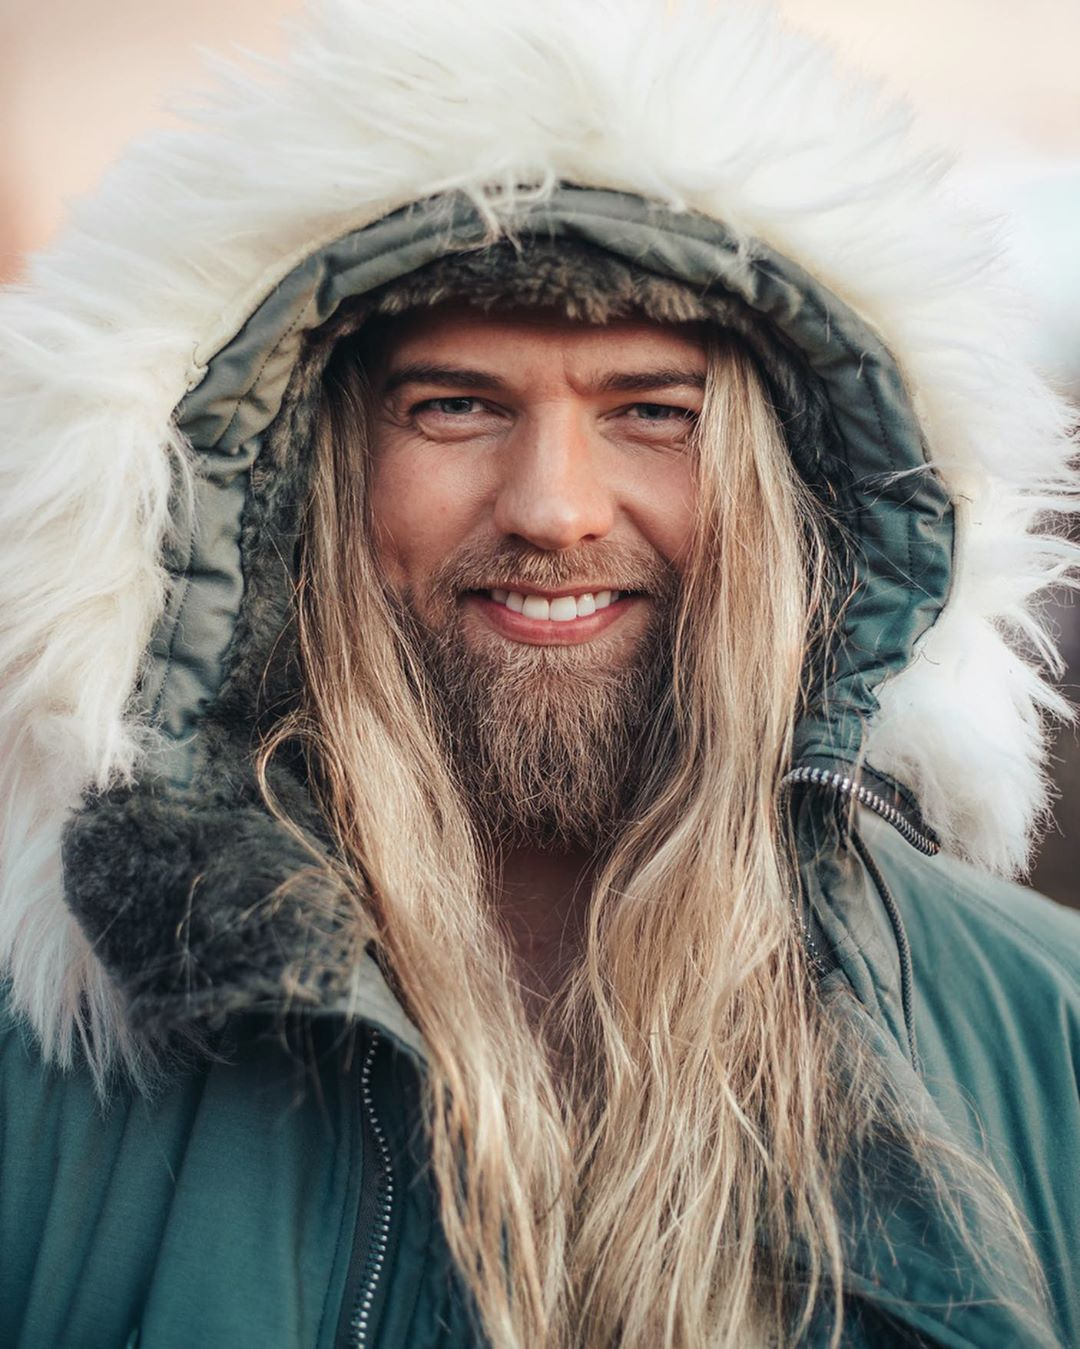 Lasse Matberg, modello e influencer norvegese